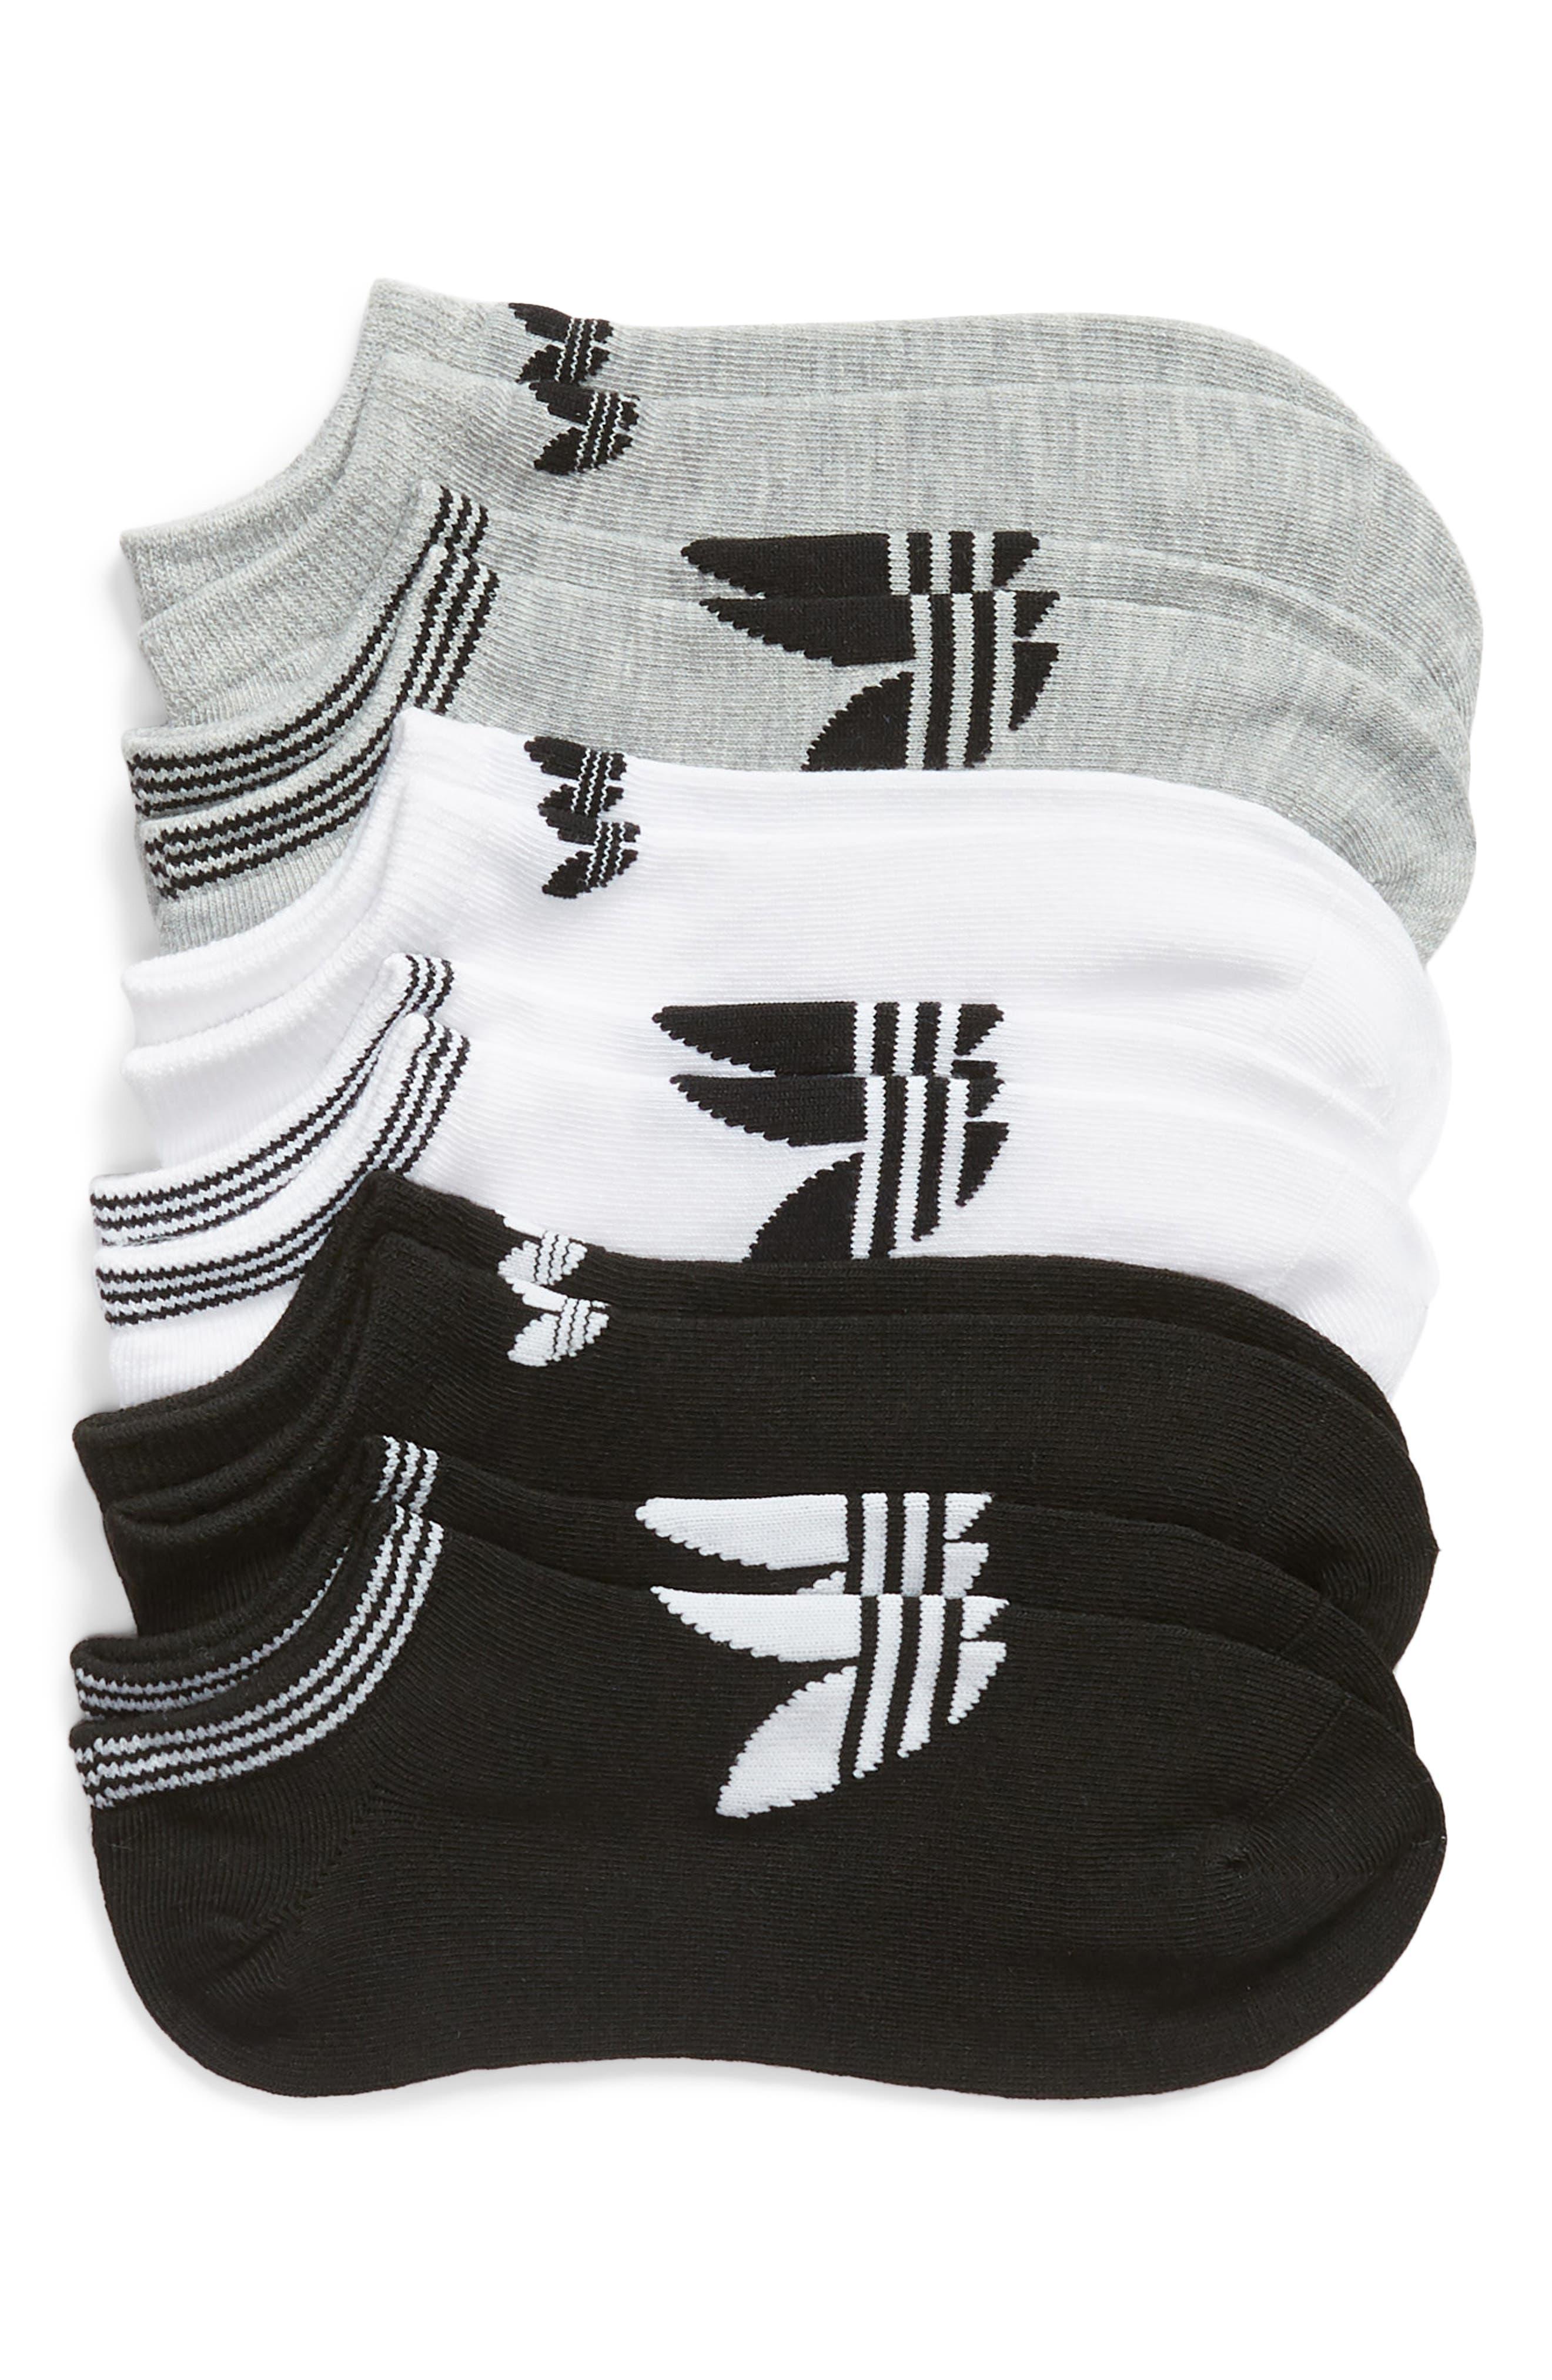 6-Pack No-Show Socks,                             Main thumbnail 1, color,                             WHITE/ LT HTHR GREY/ BLACK